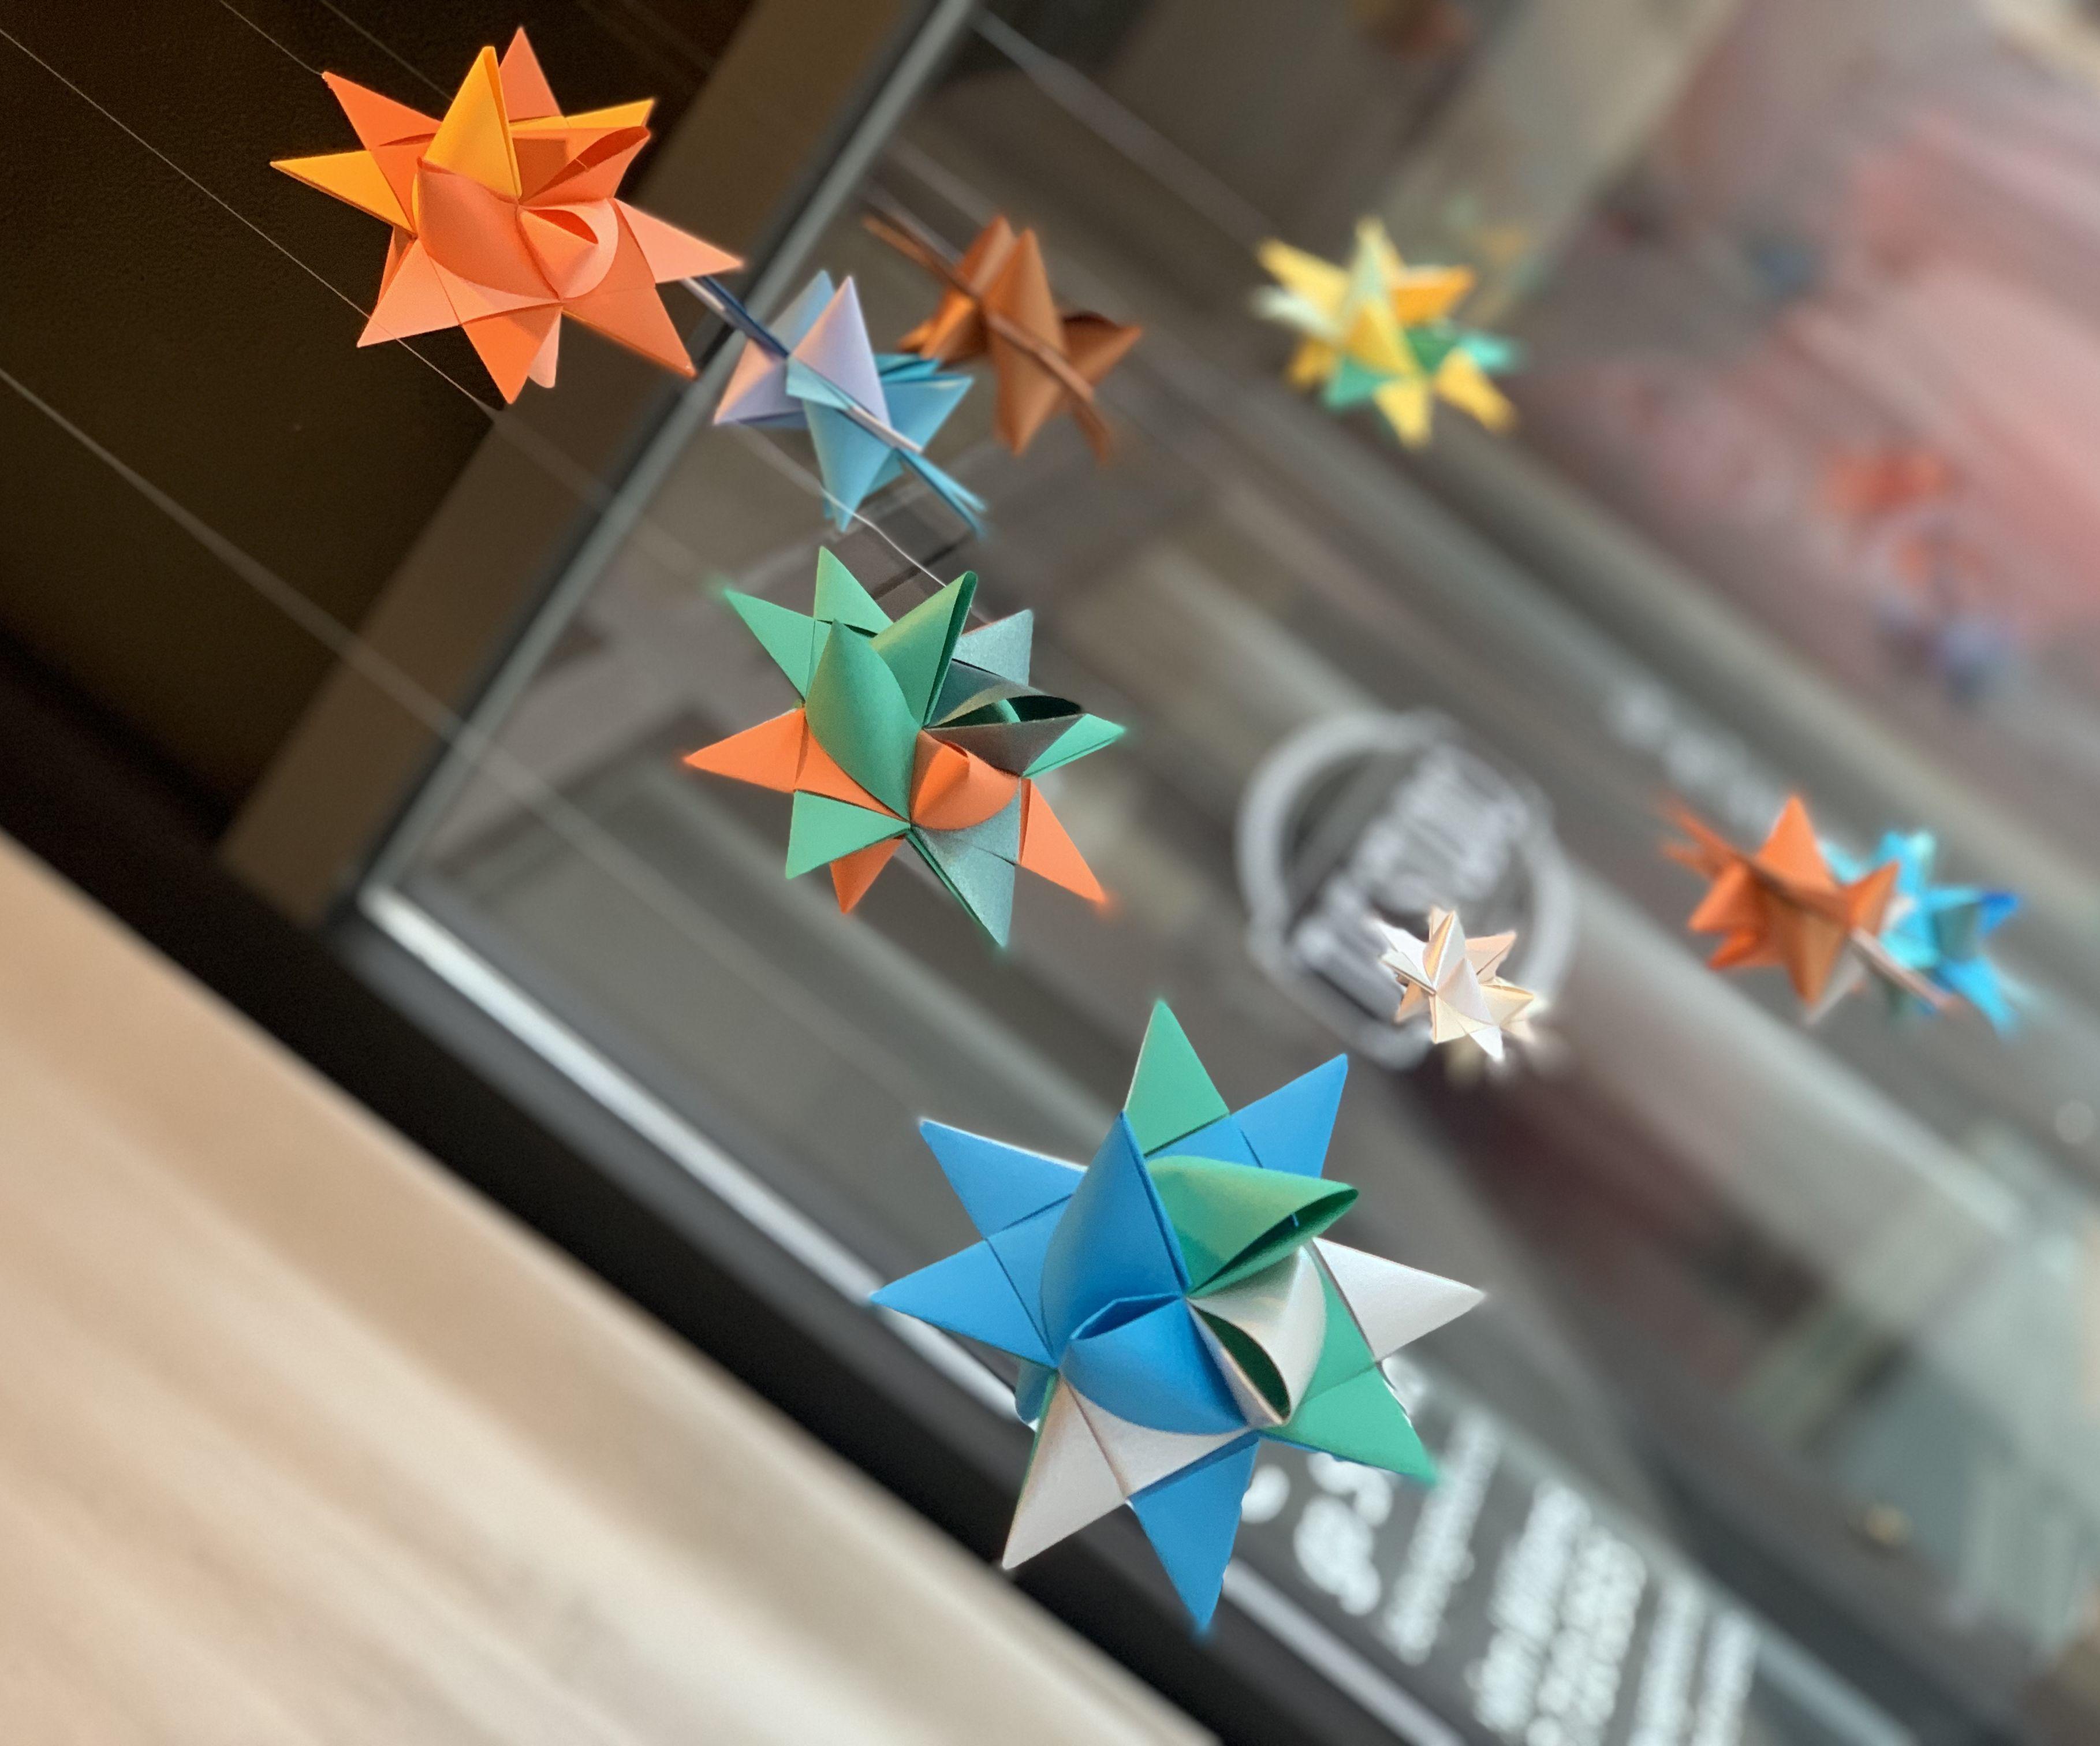 Paper Origami Moravian Star - Aka Fold Paper a Billion Times